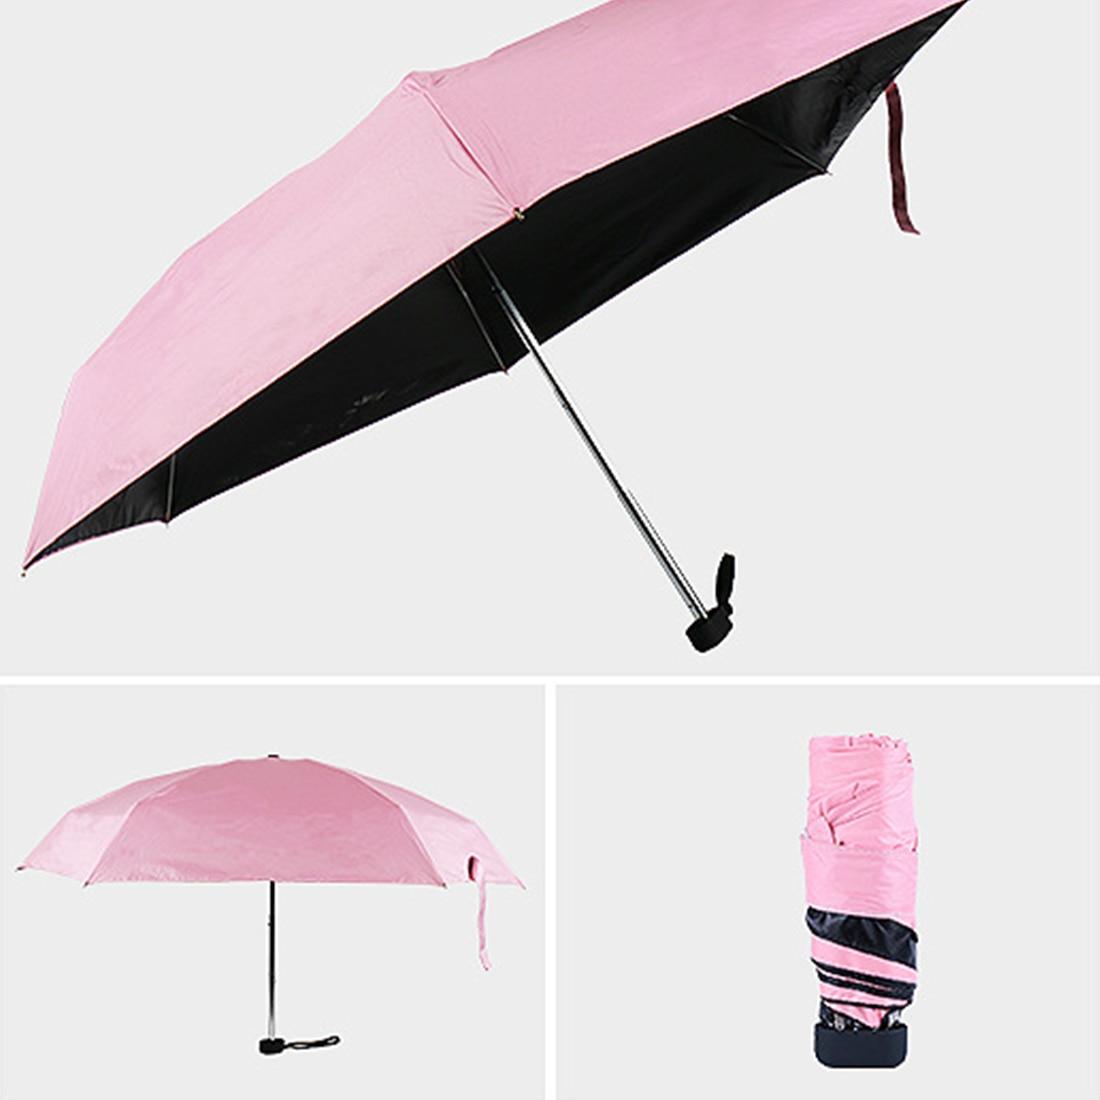 Mini Pocket Umbrella Women Sunny and Rainy Mini Folding Umbrellas 200g Small Sun outdoor Parasol Umbrella